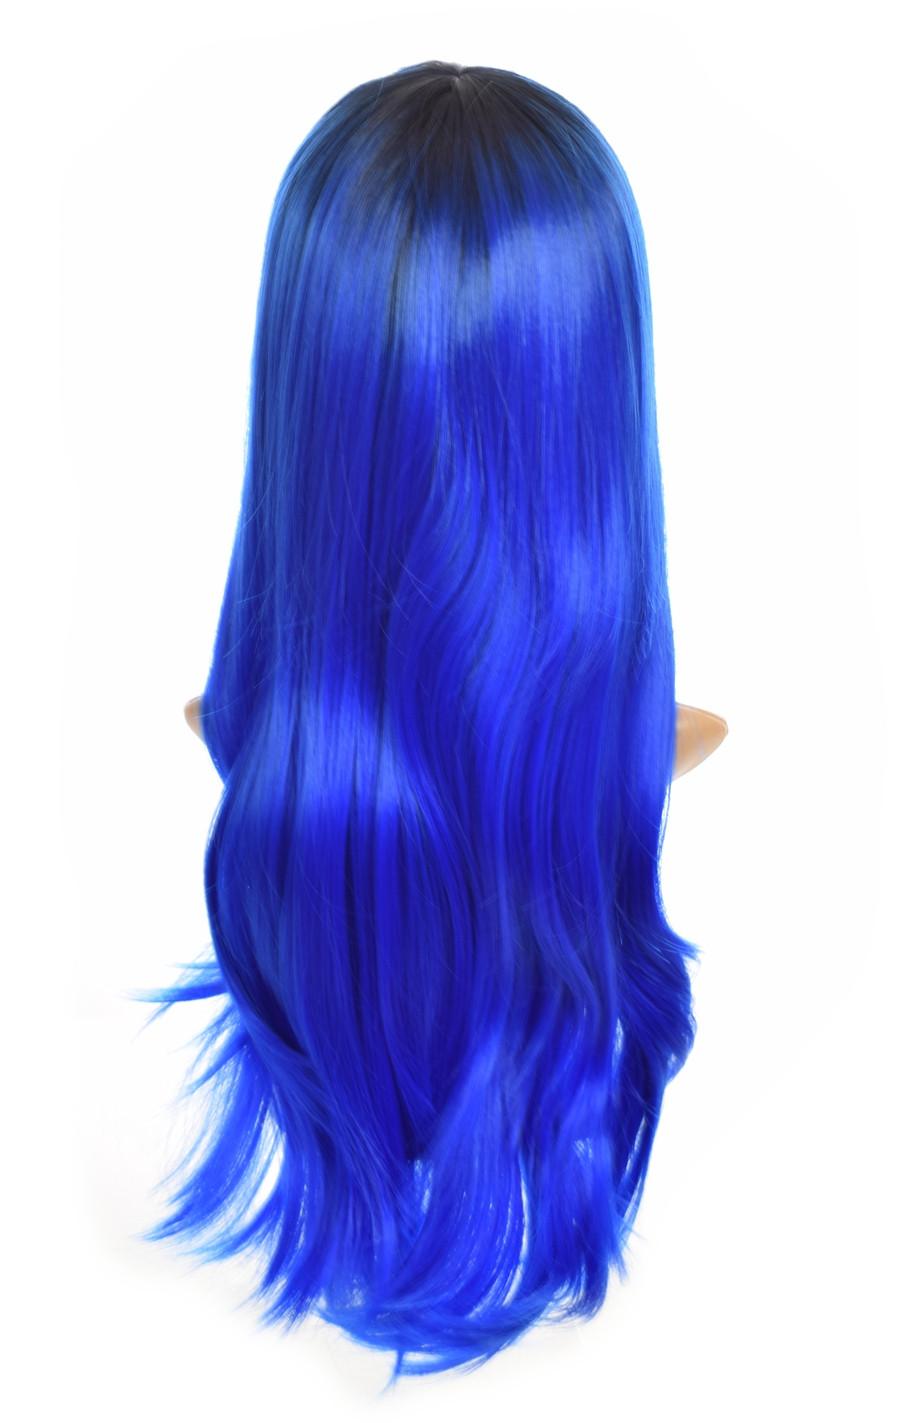 Blue Ink Straight Long Wig. Rear